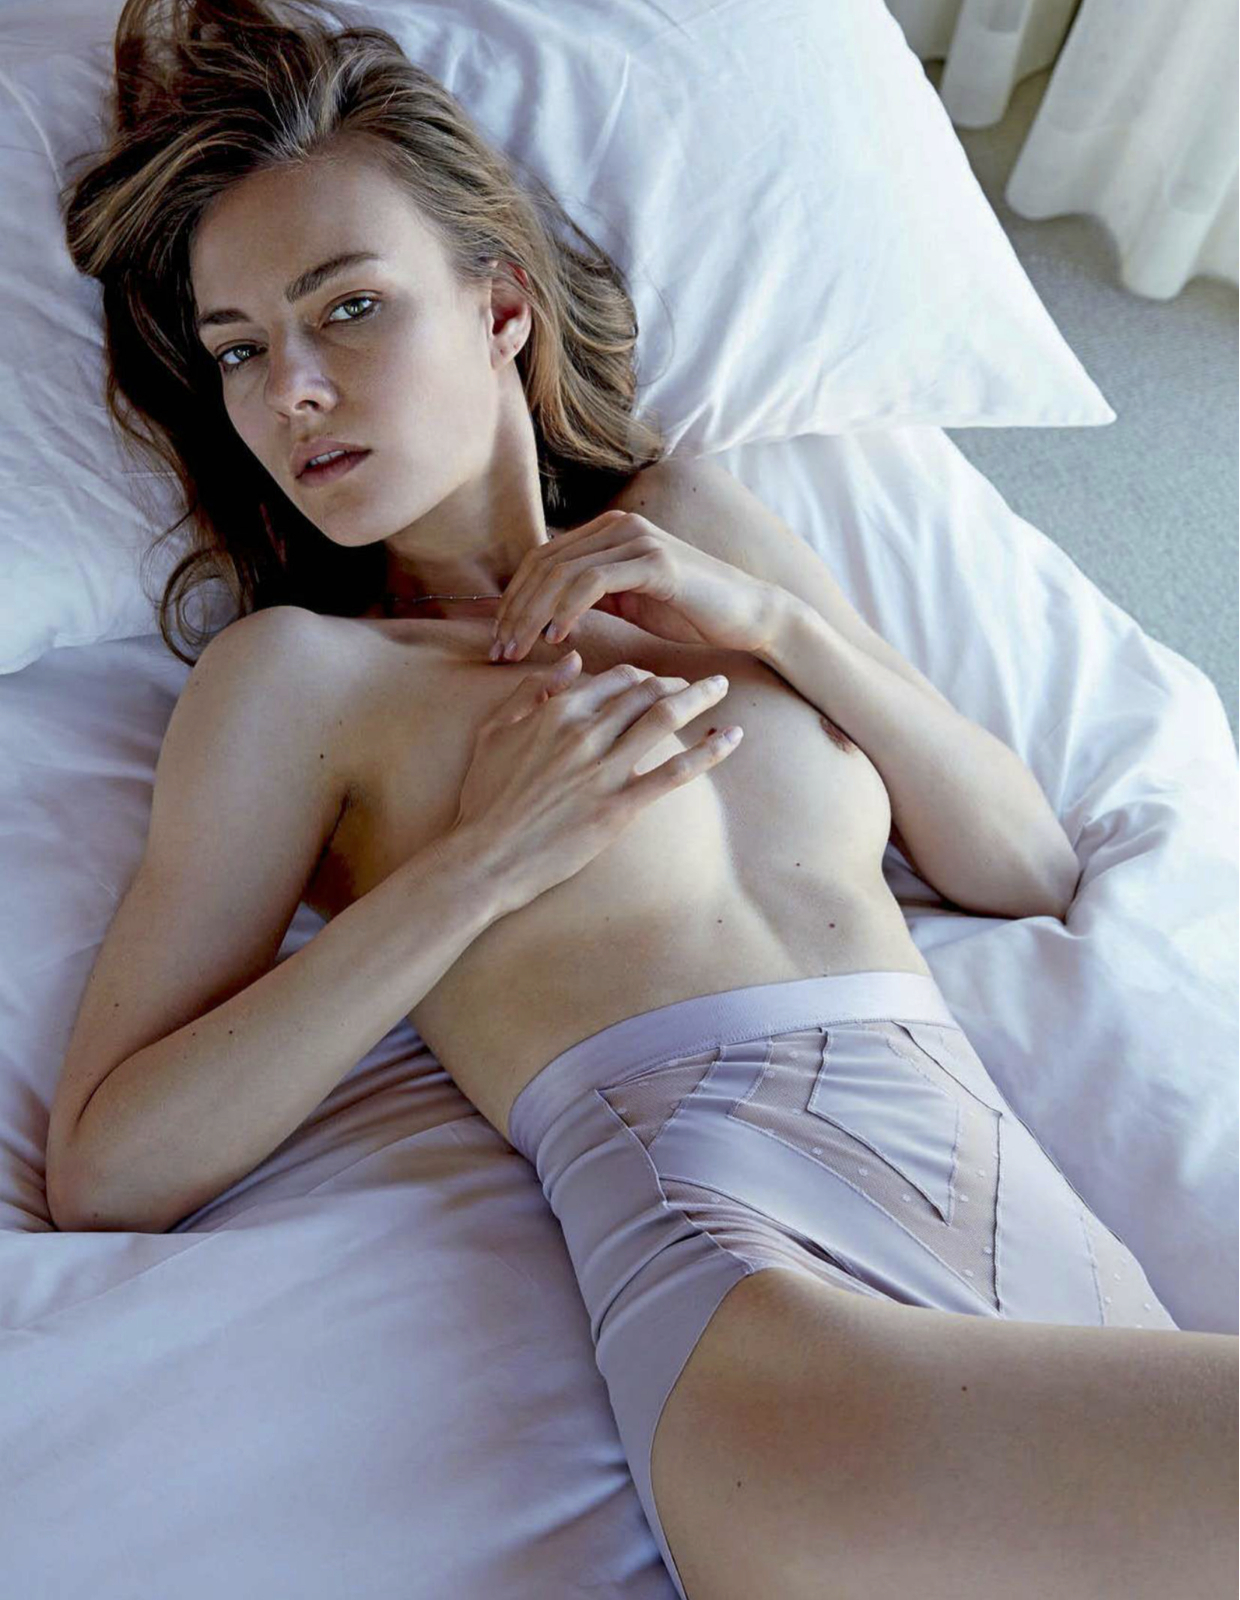 Chelsea Handlers Possible Leak,Linda Hamilton Black Moon Rising  Adult video Amy winehouse,Jennifer Grey Nude Photos and Videos